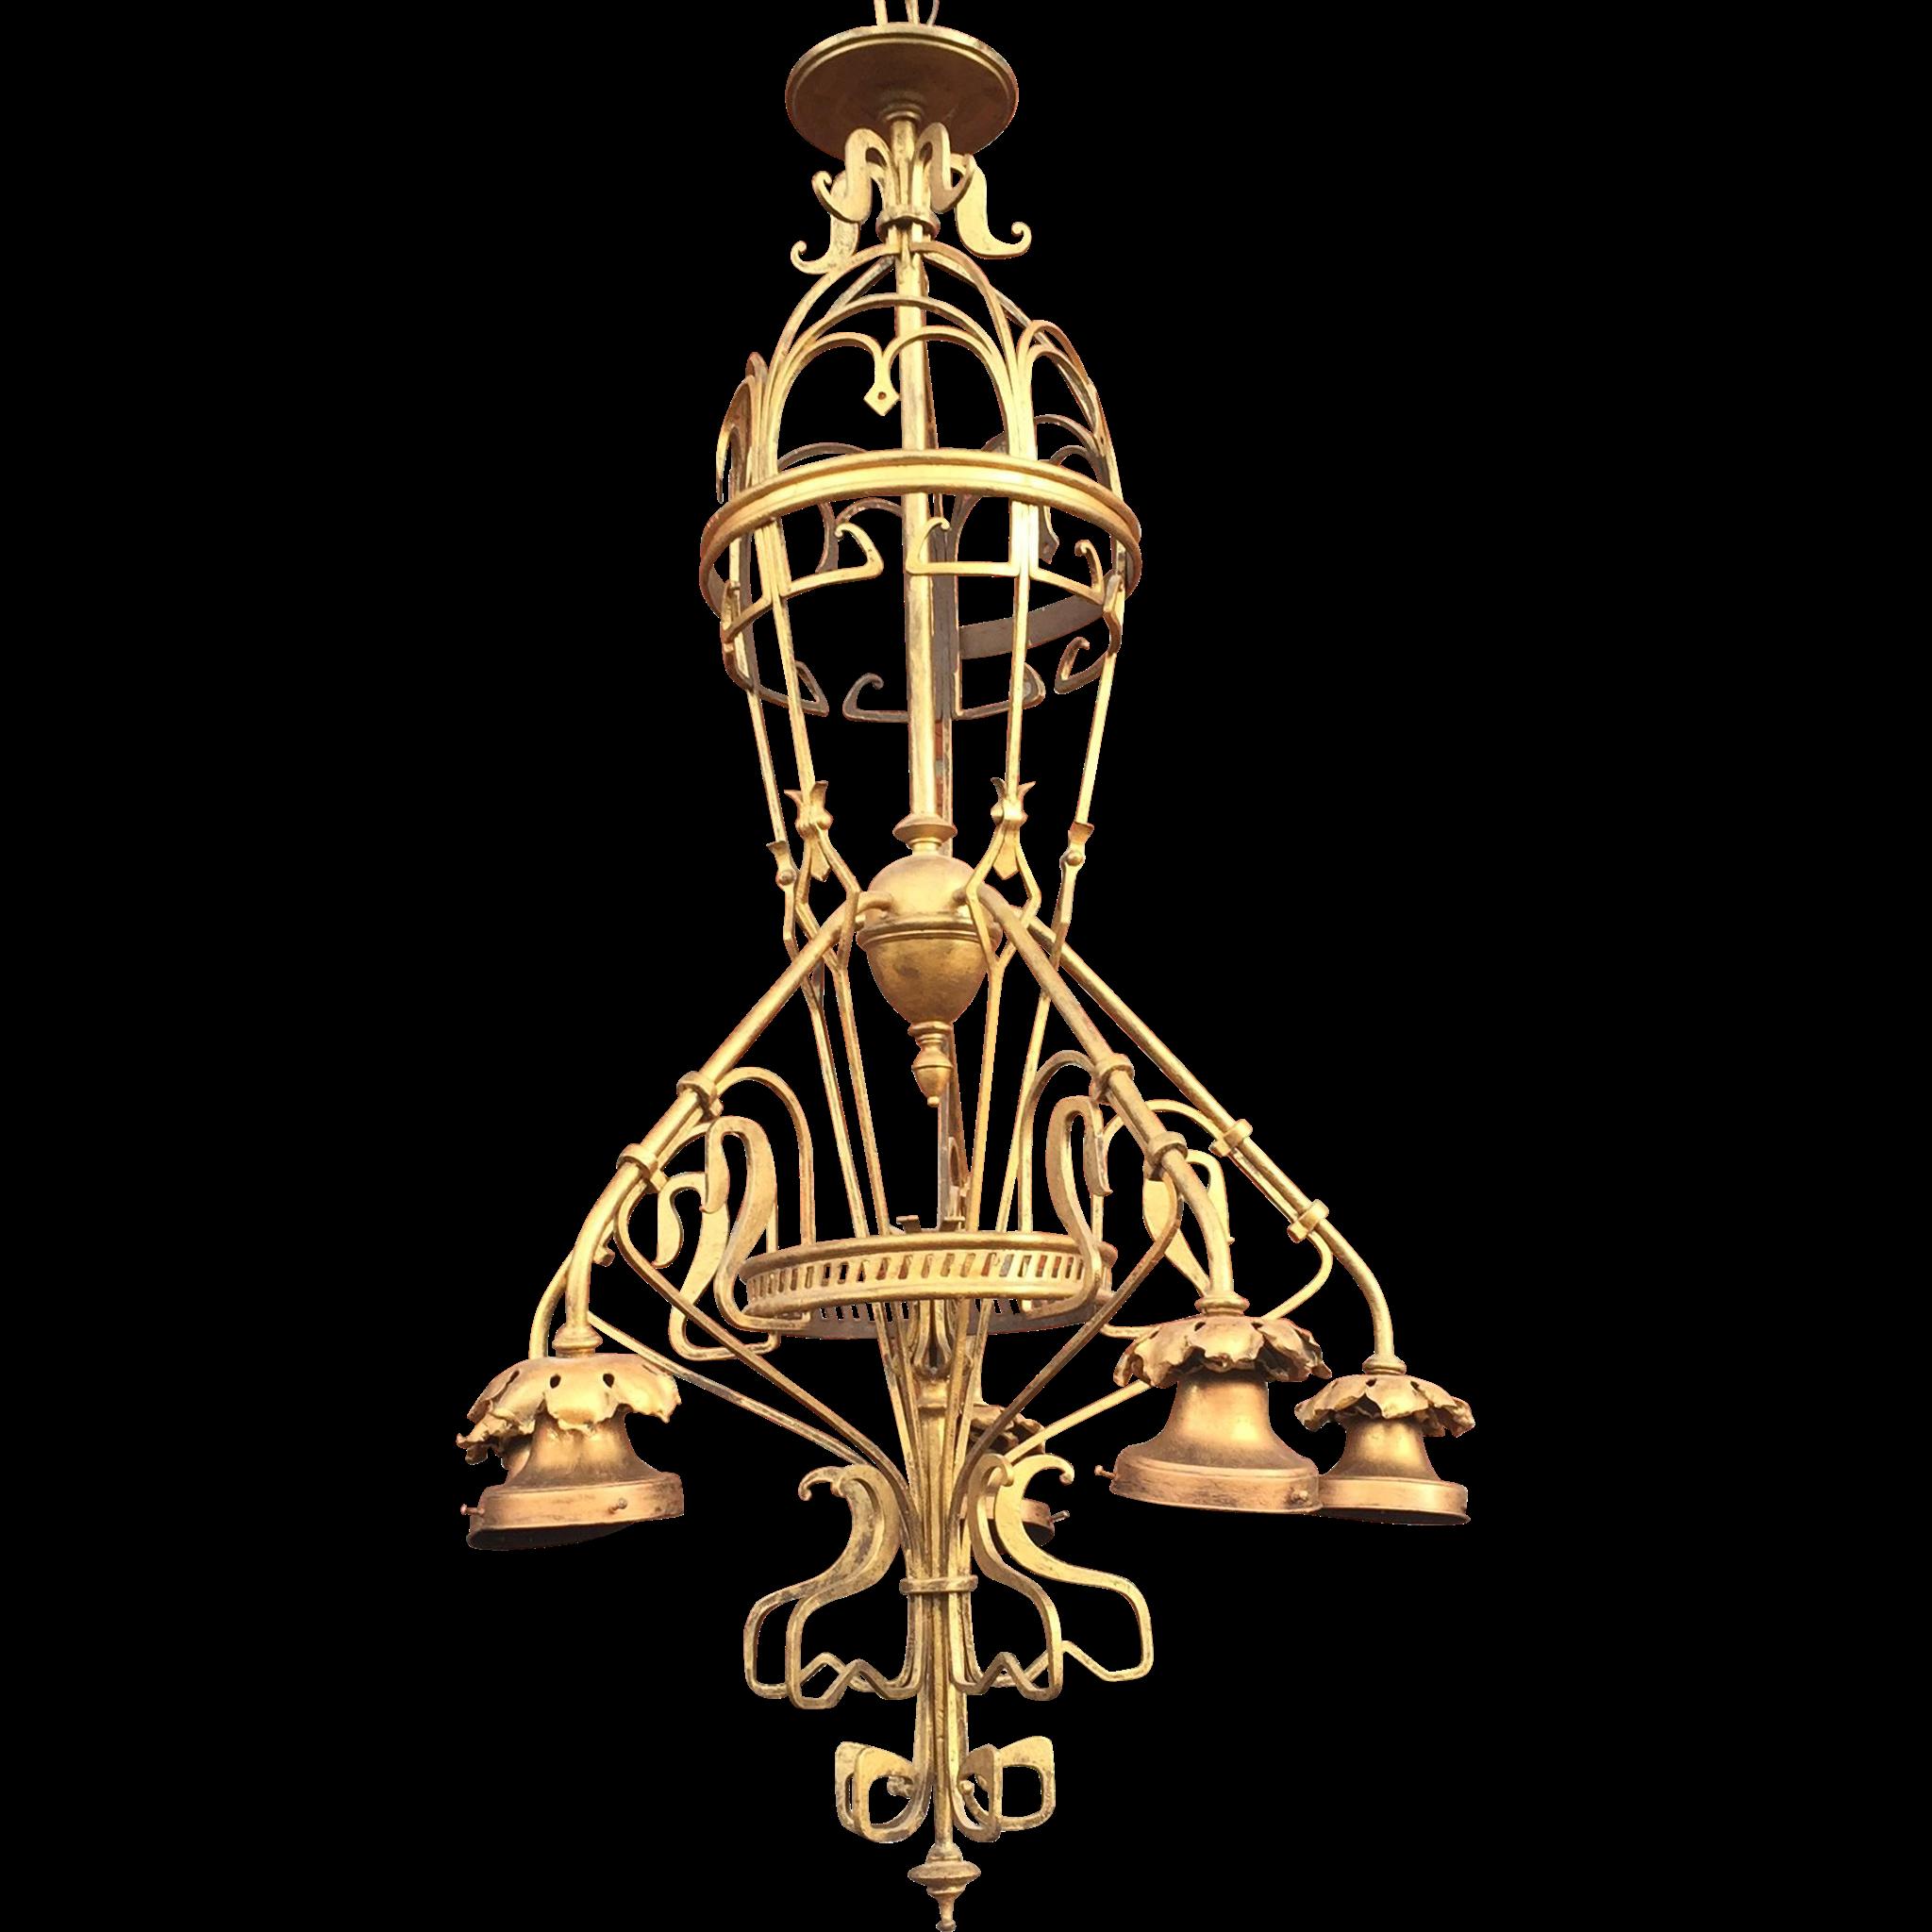 Gustave Serrurier-Bovy Iron Brass Chandelier Art Nouveau